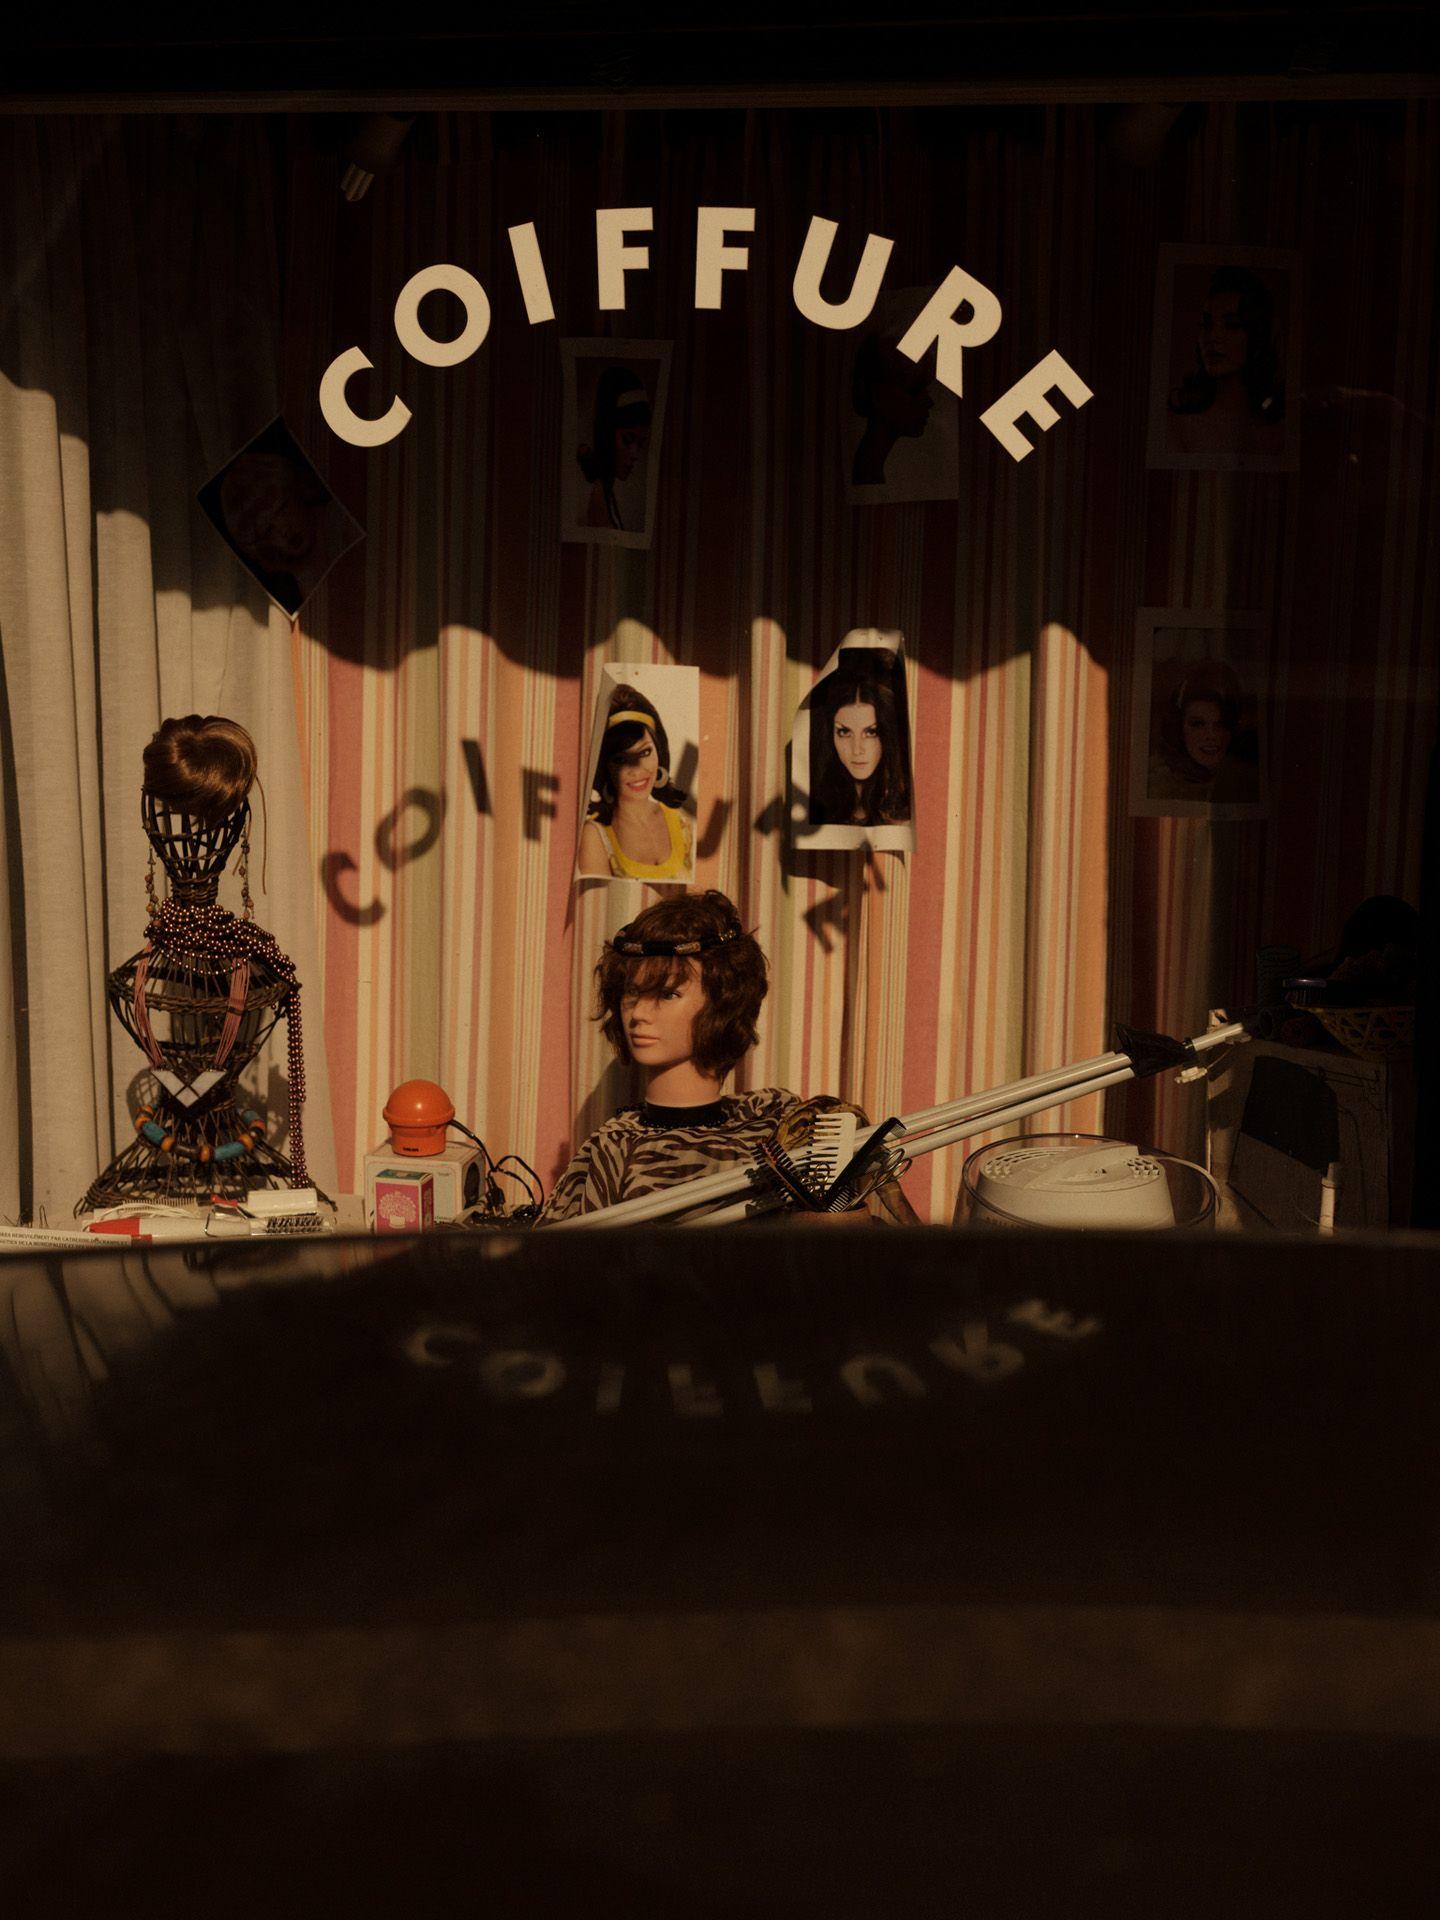 hairdresser shop window by Alexi Hobbs in Auvergne for Reflets de France